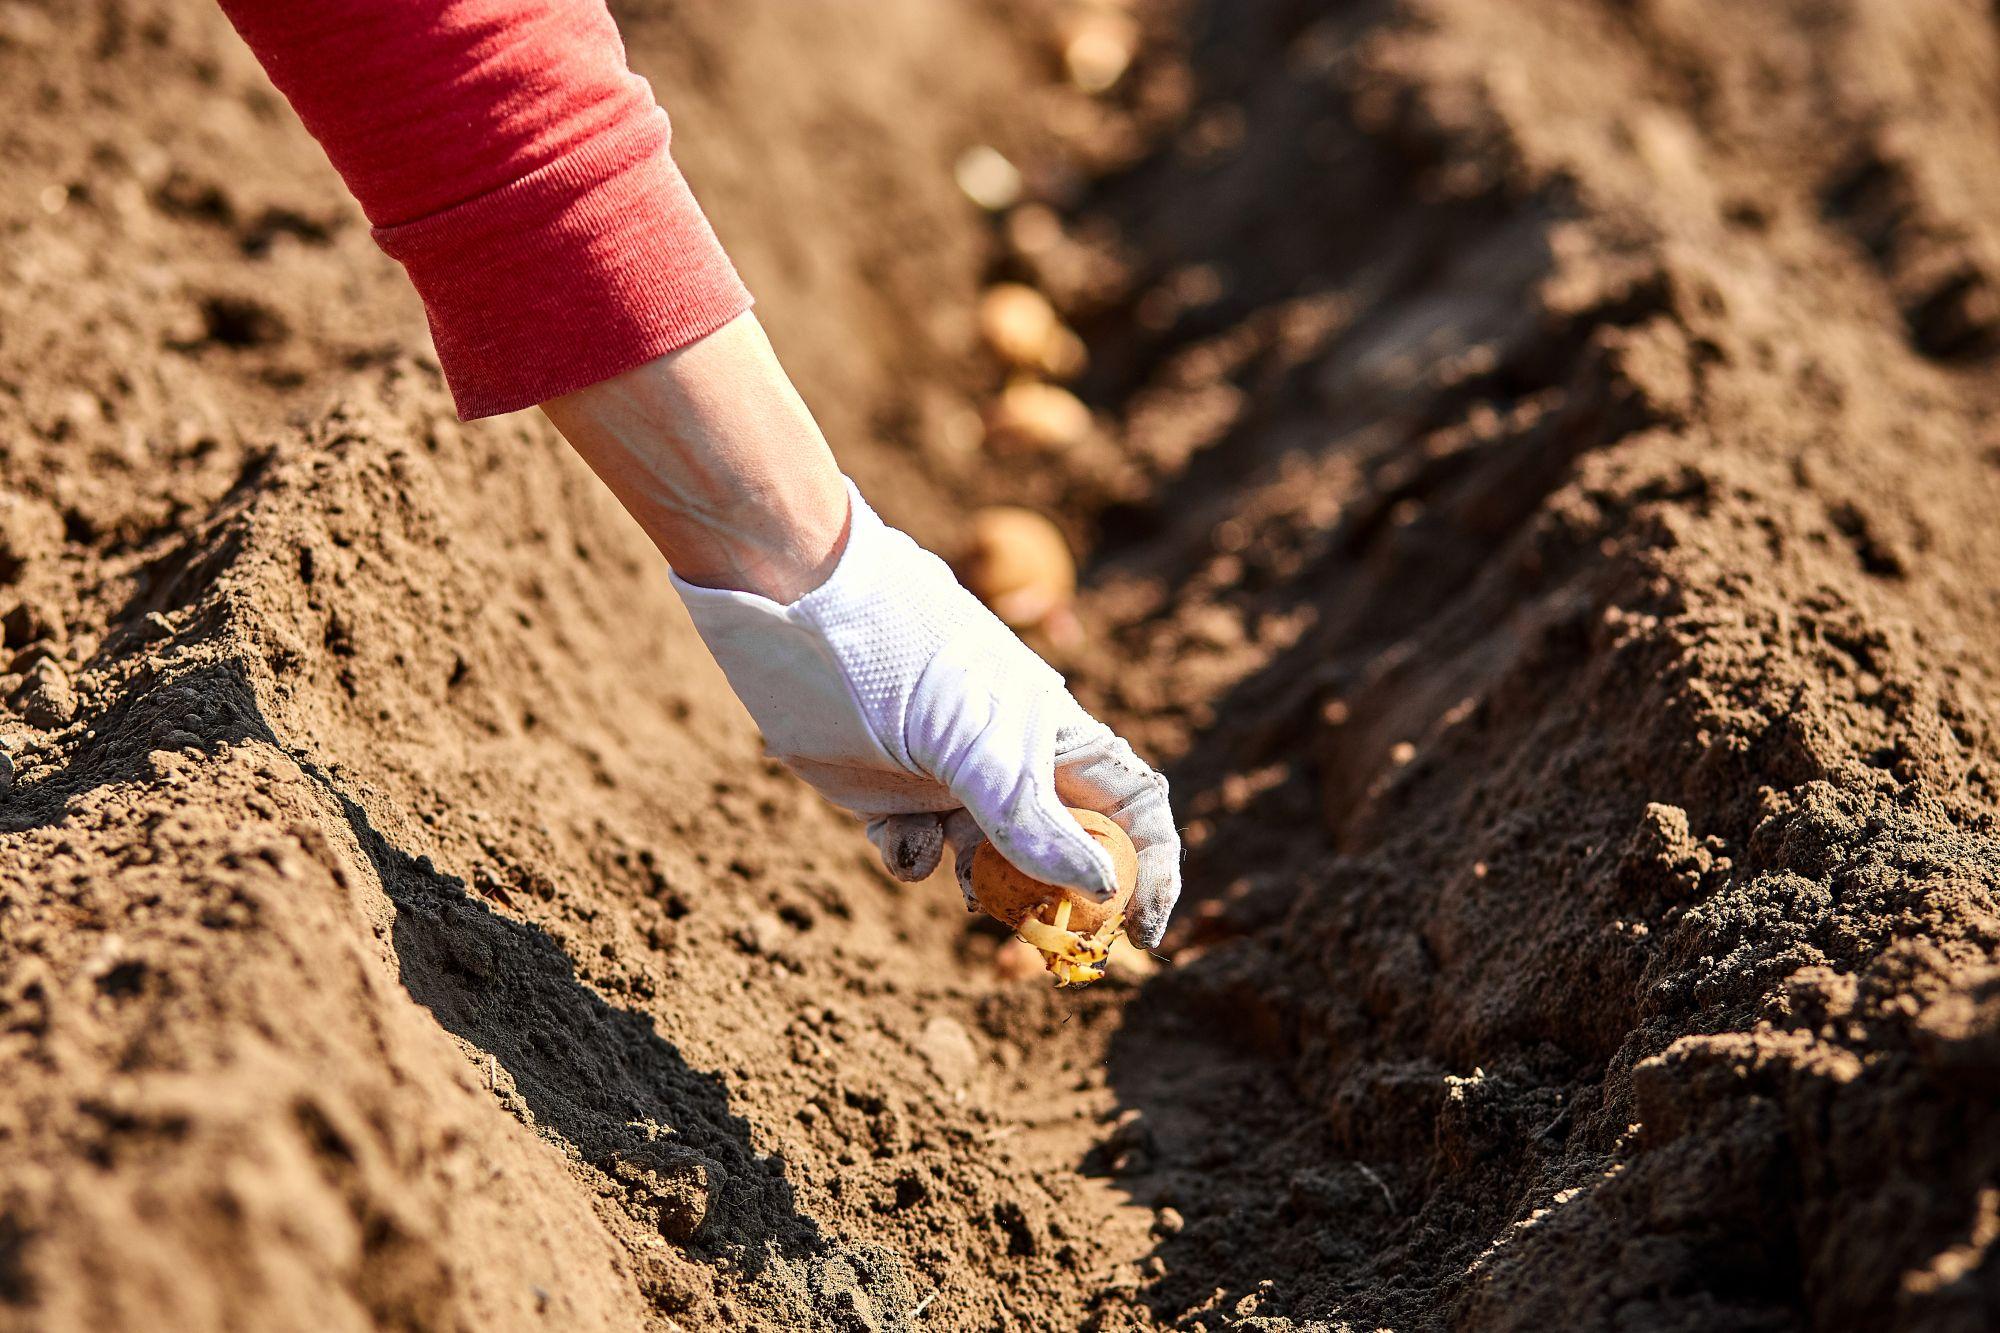 woman-hand-planting-potato-tubers-into-the-ground-UZJXAWF